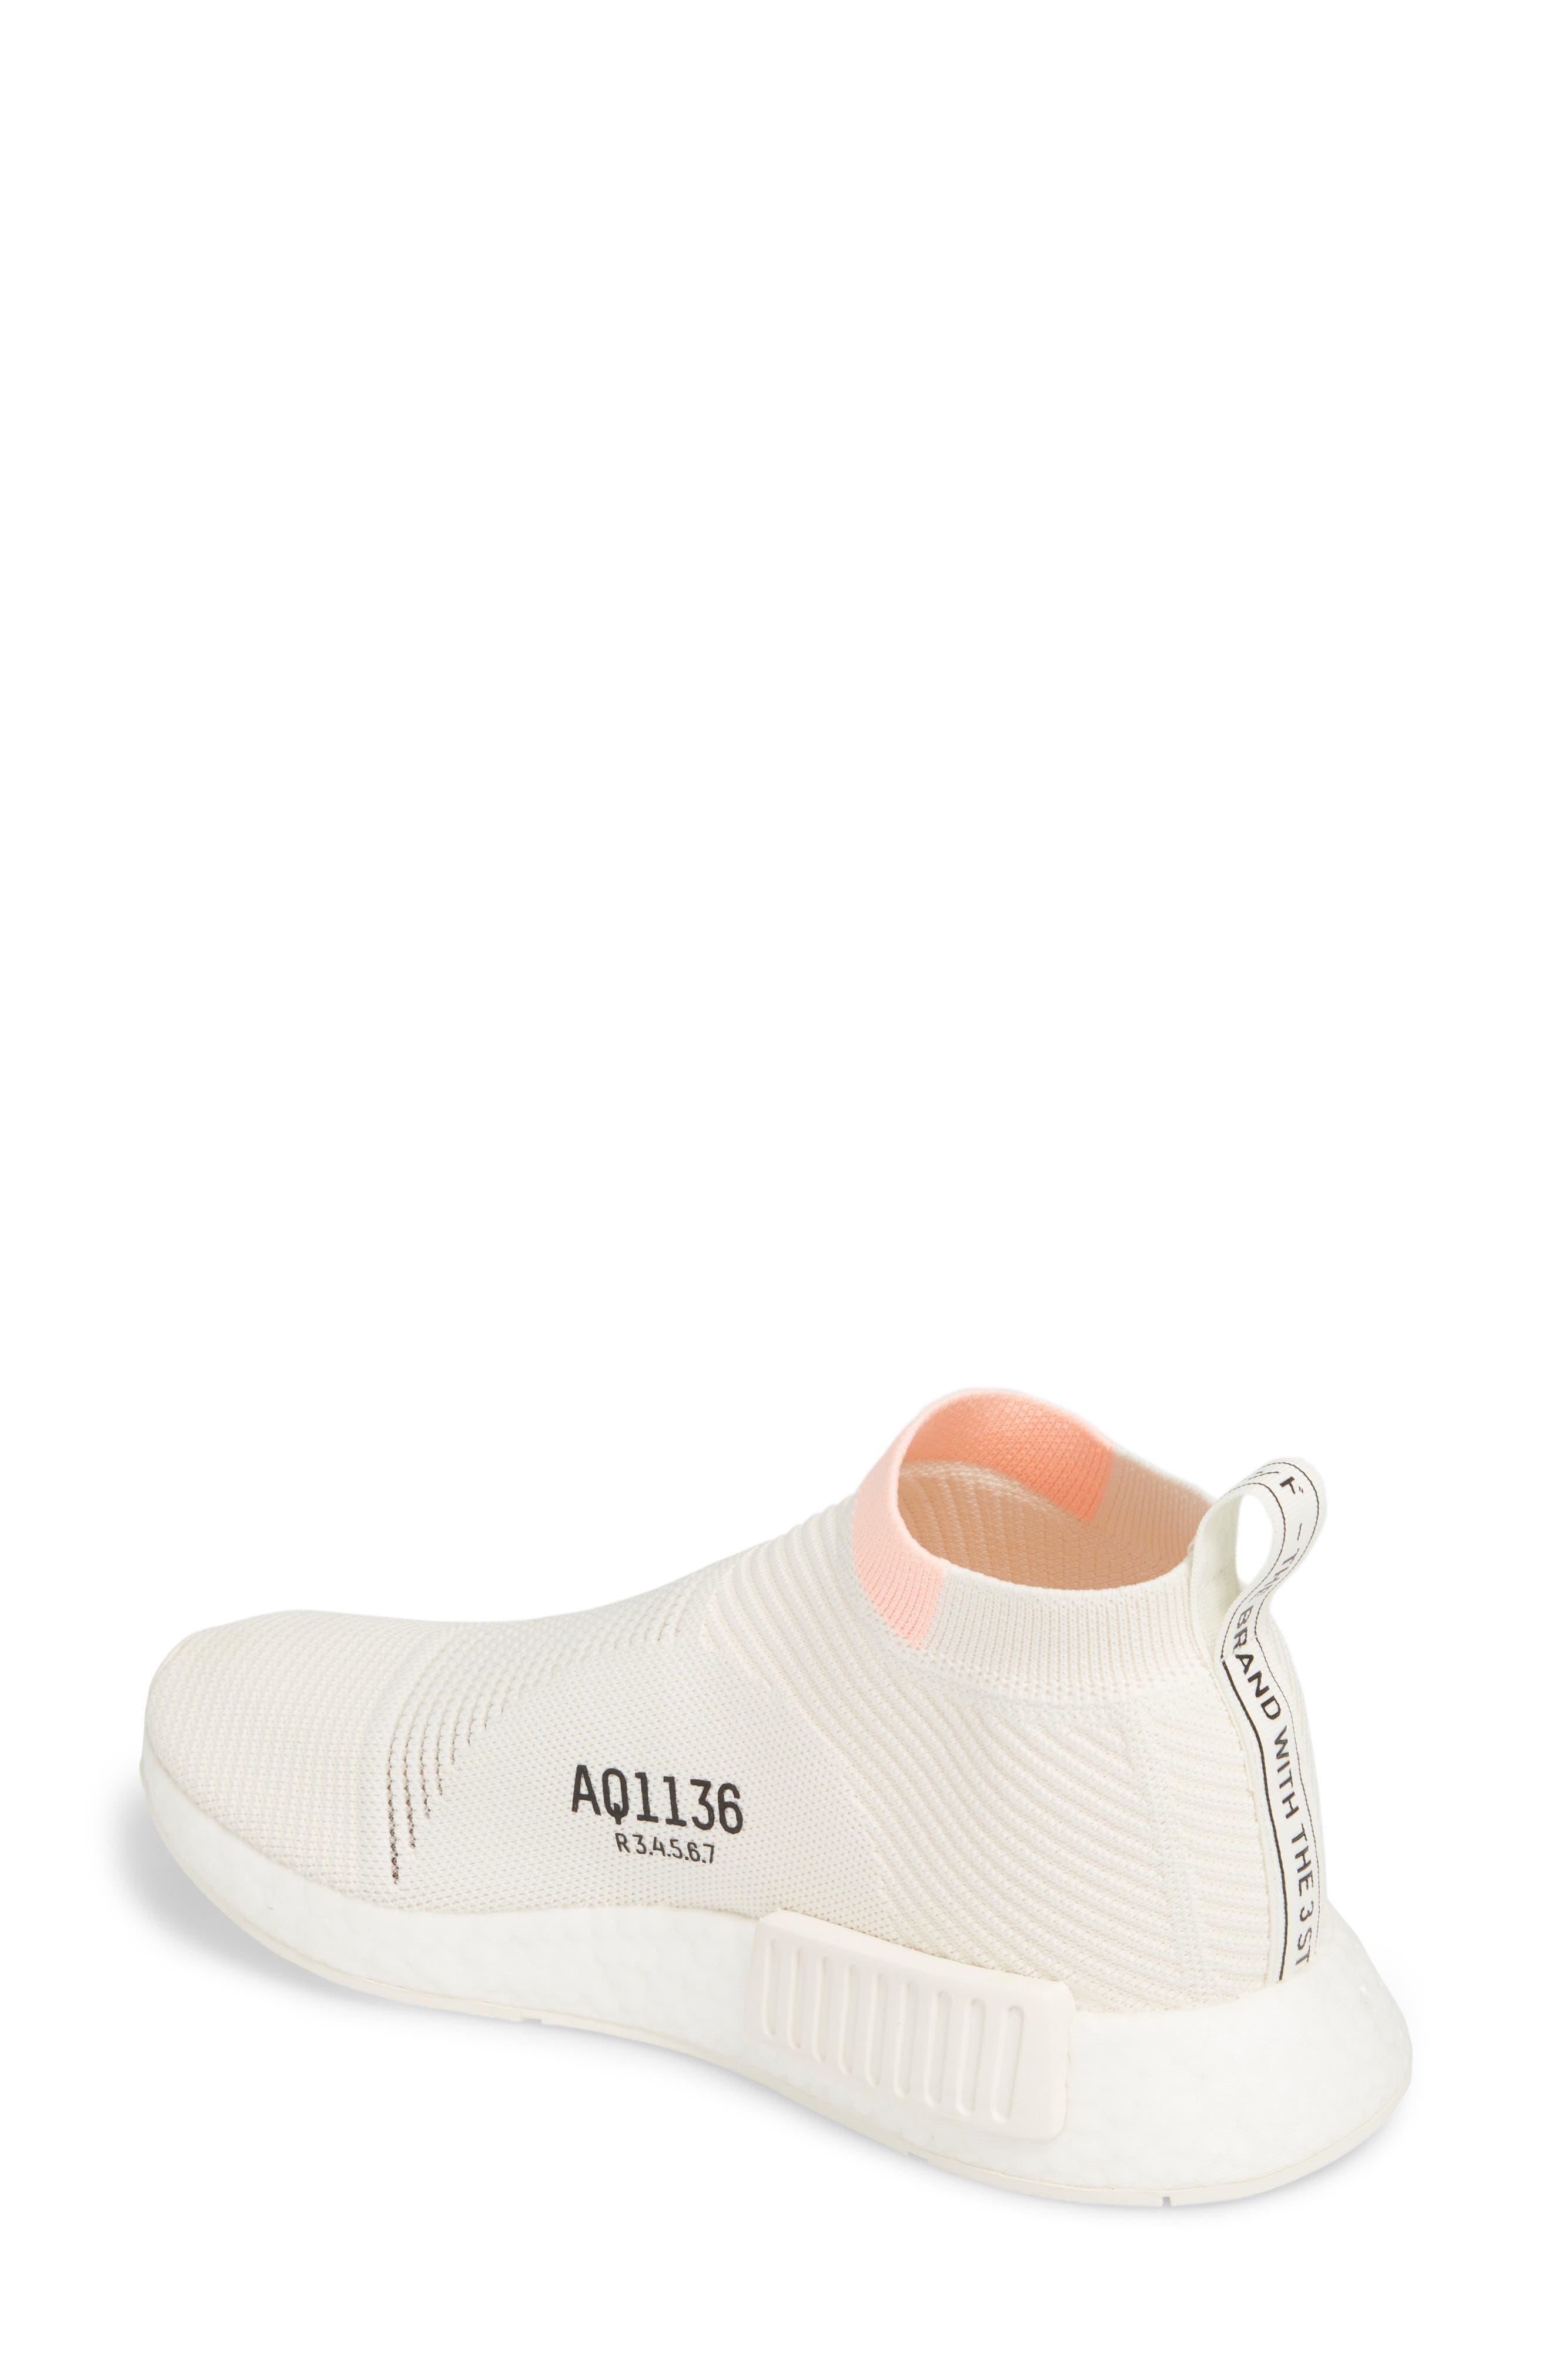 NMD_CS1 Primeknit Sneaker,                             Alternate thumbnail 2, color,                             CLOUD WHITE/ CLEAR ORANGE